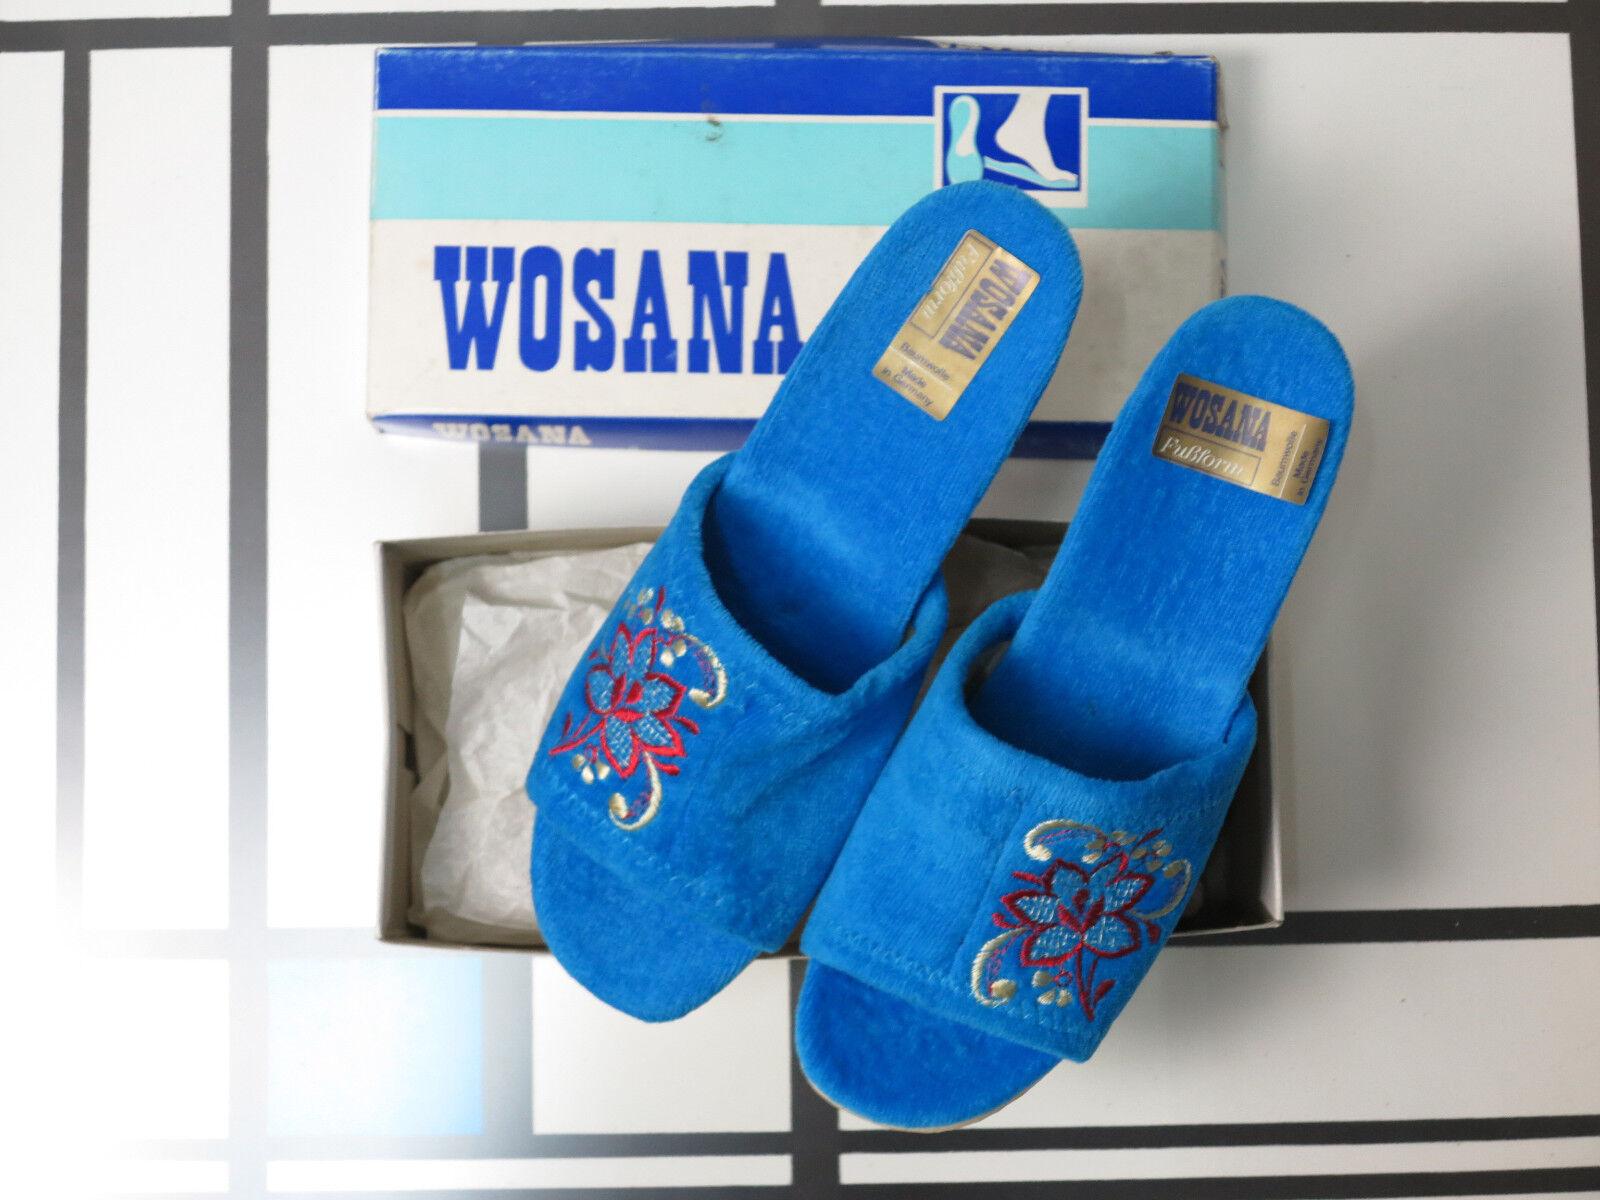 Wosana Wosana Wosana fußform Pantofole Da Donna Pantofole COTONE 70er True Vintage 70s OVP d38188